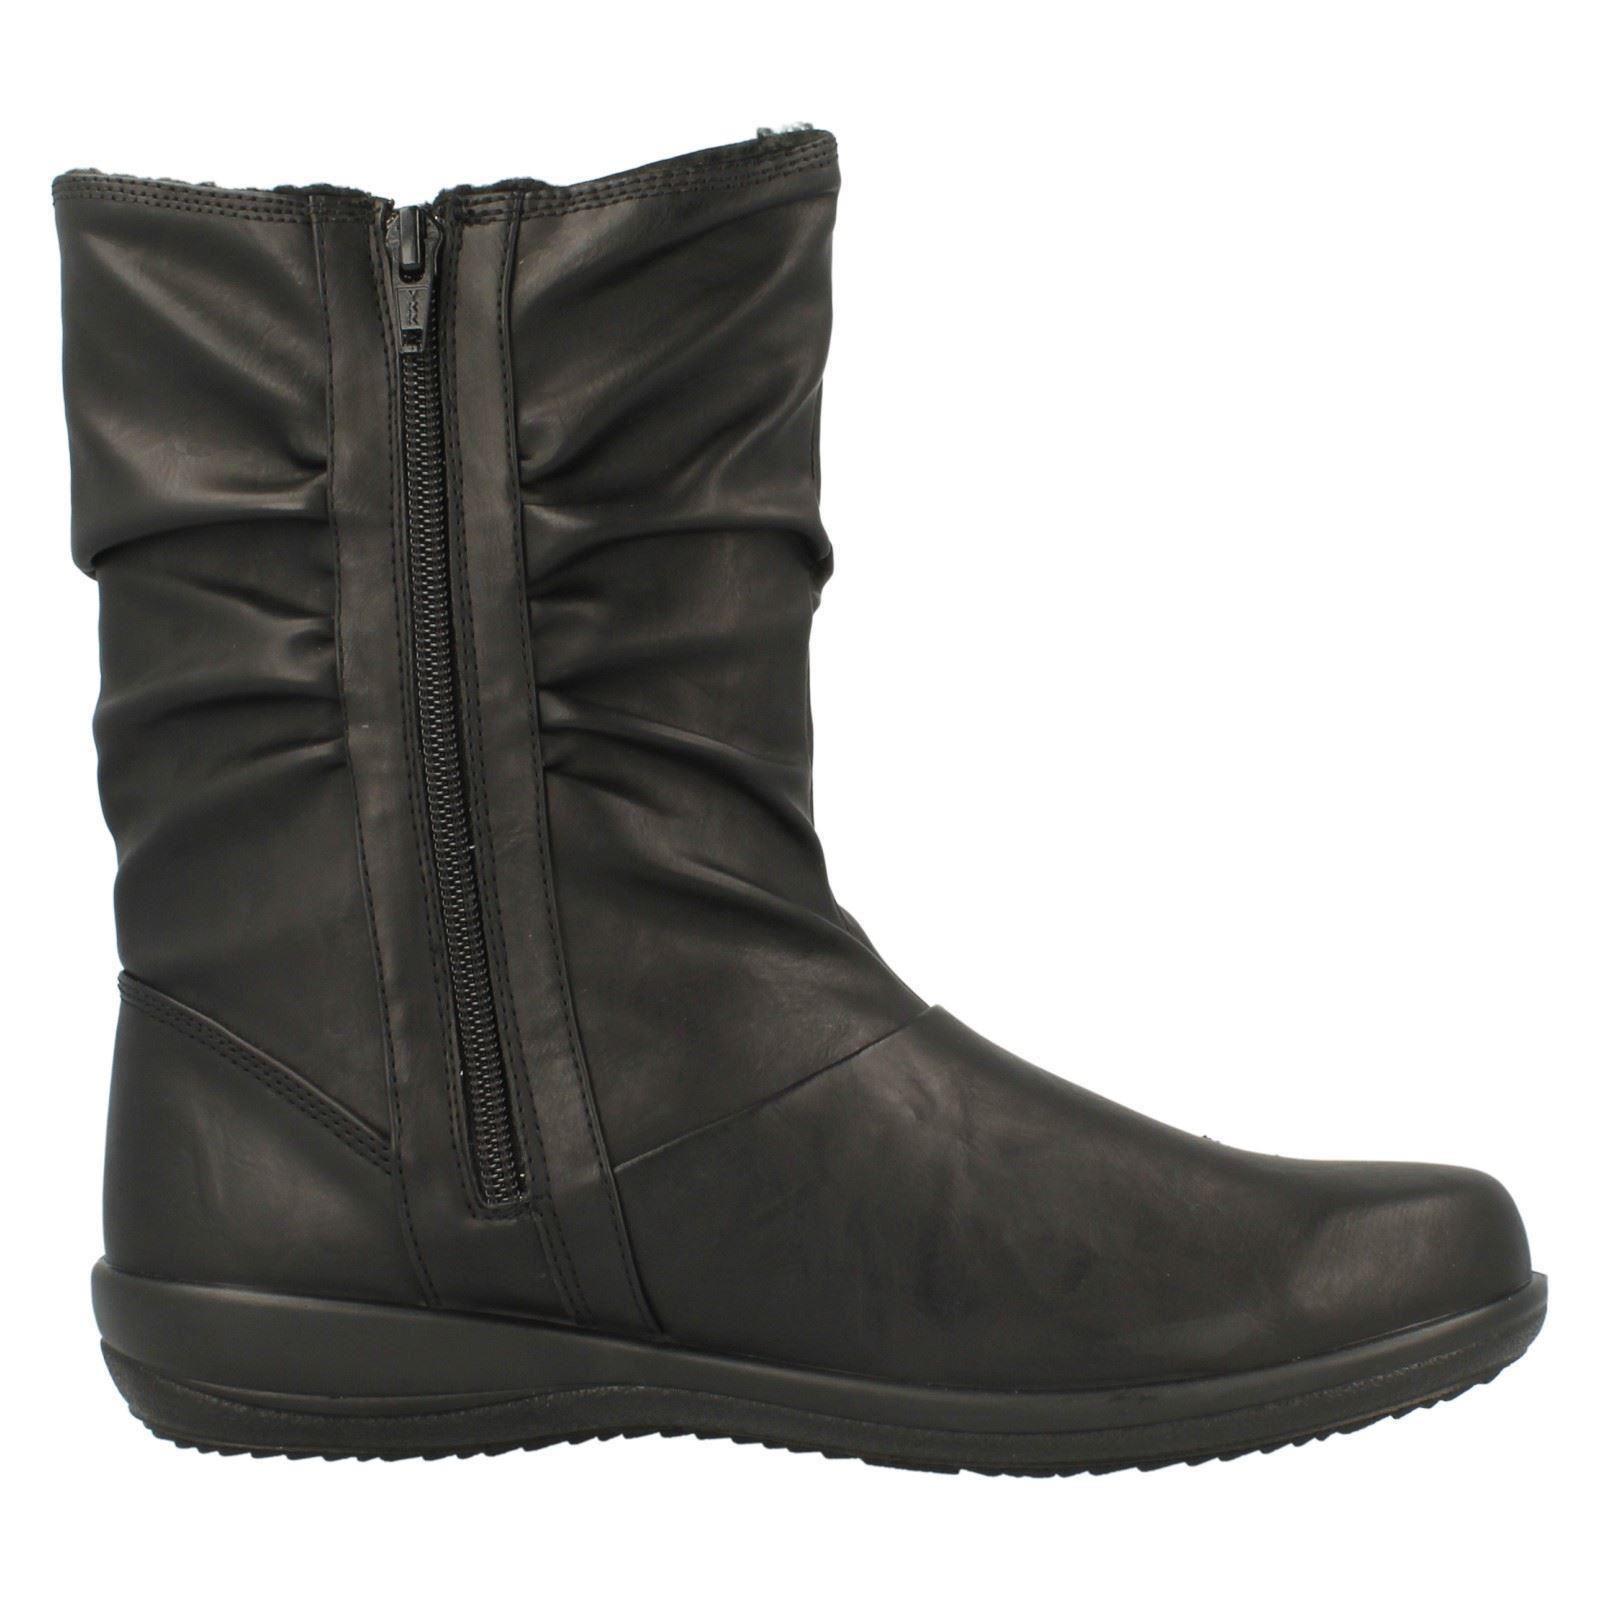 Zapatos especiales con descuento mujer Padders corte ancho Botas De Media Caña índigo